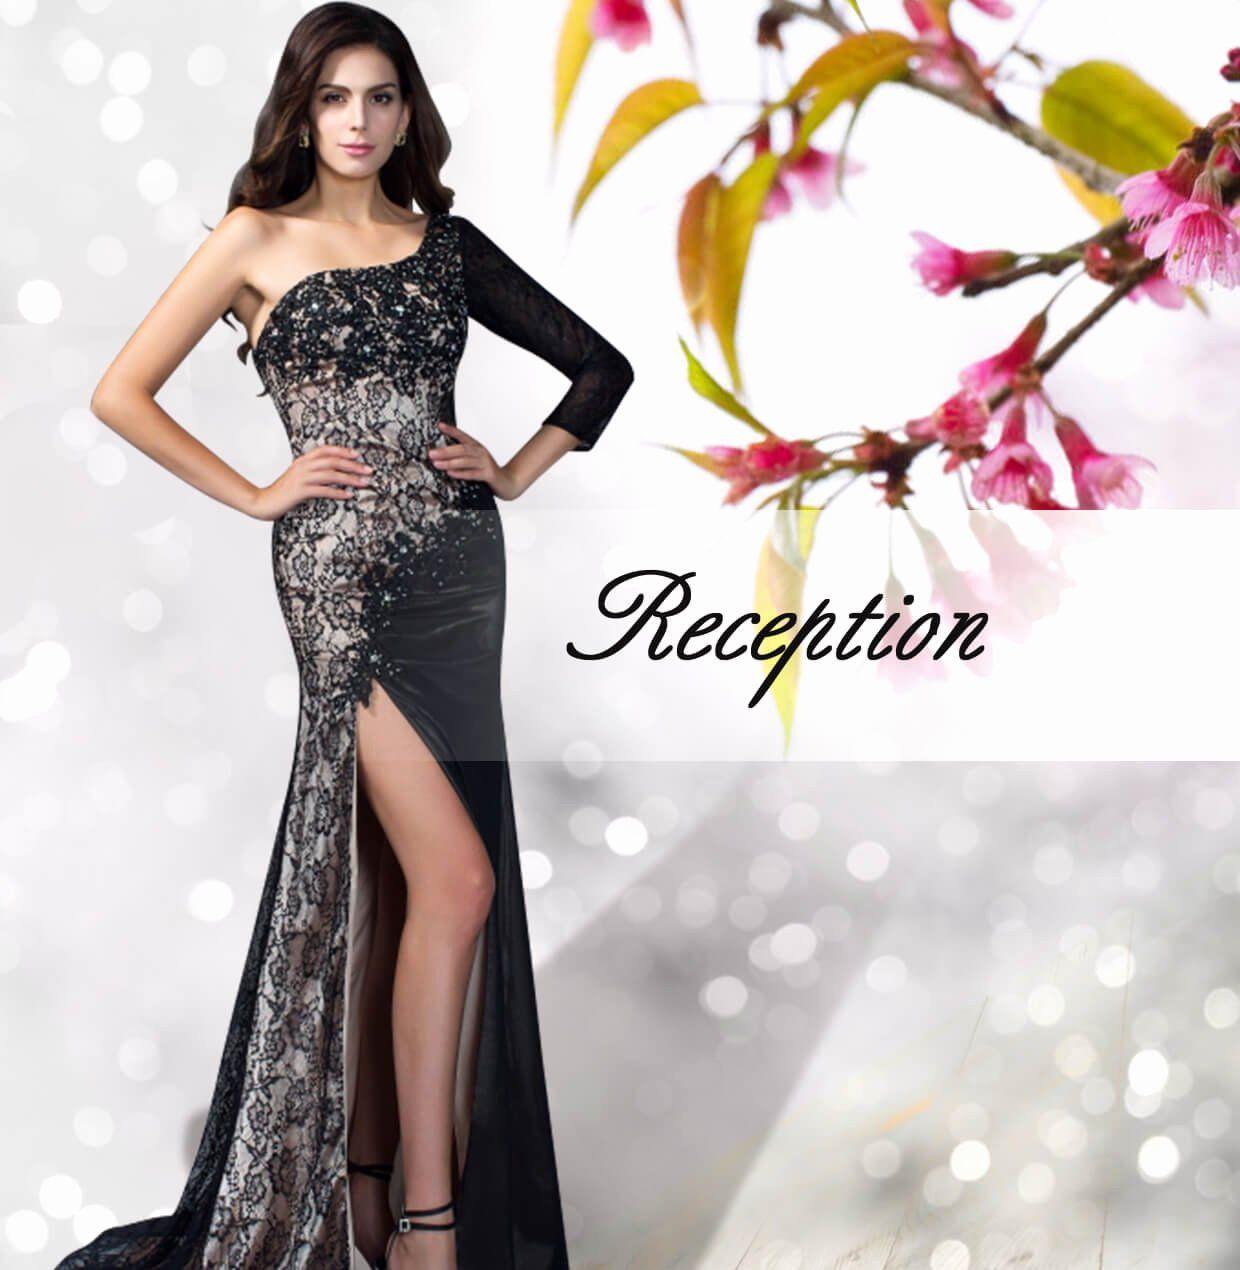 Wedding Dress Design Online Free In 2020 Dresses White Wedding Dresses Hot Prom Dress